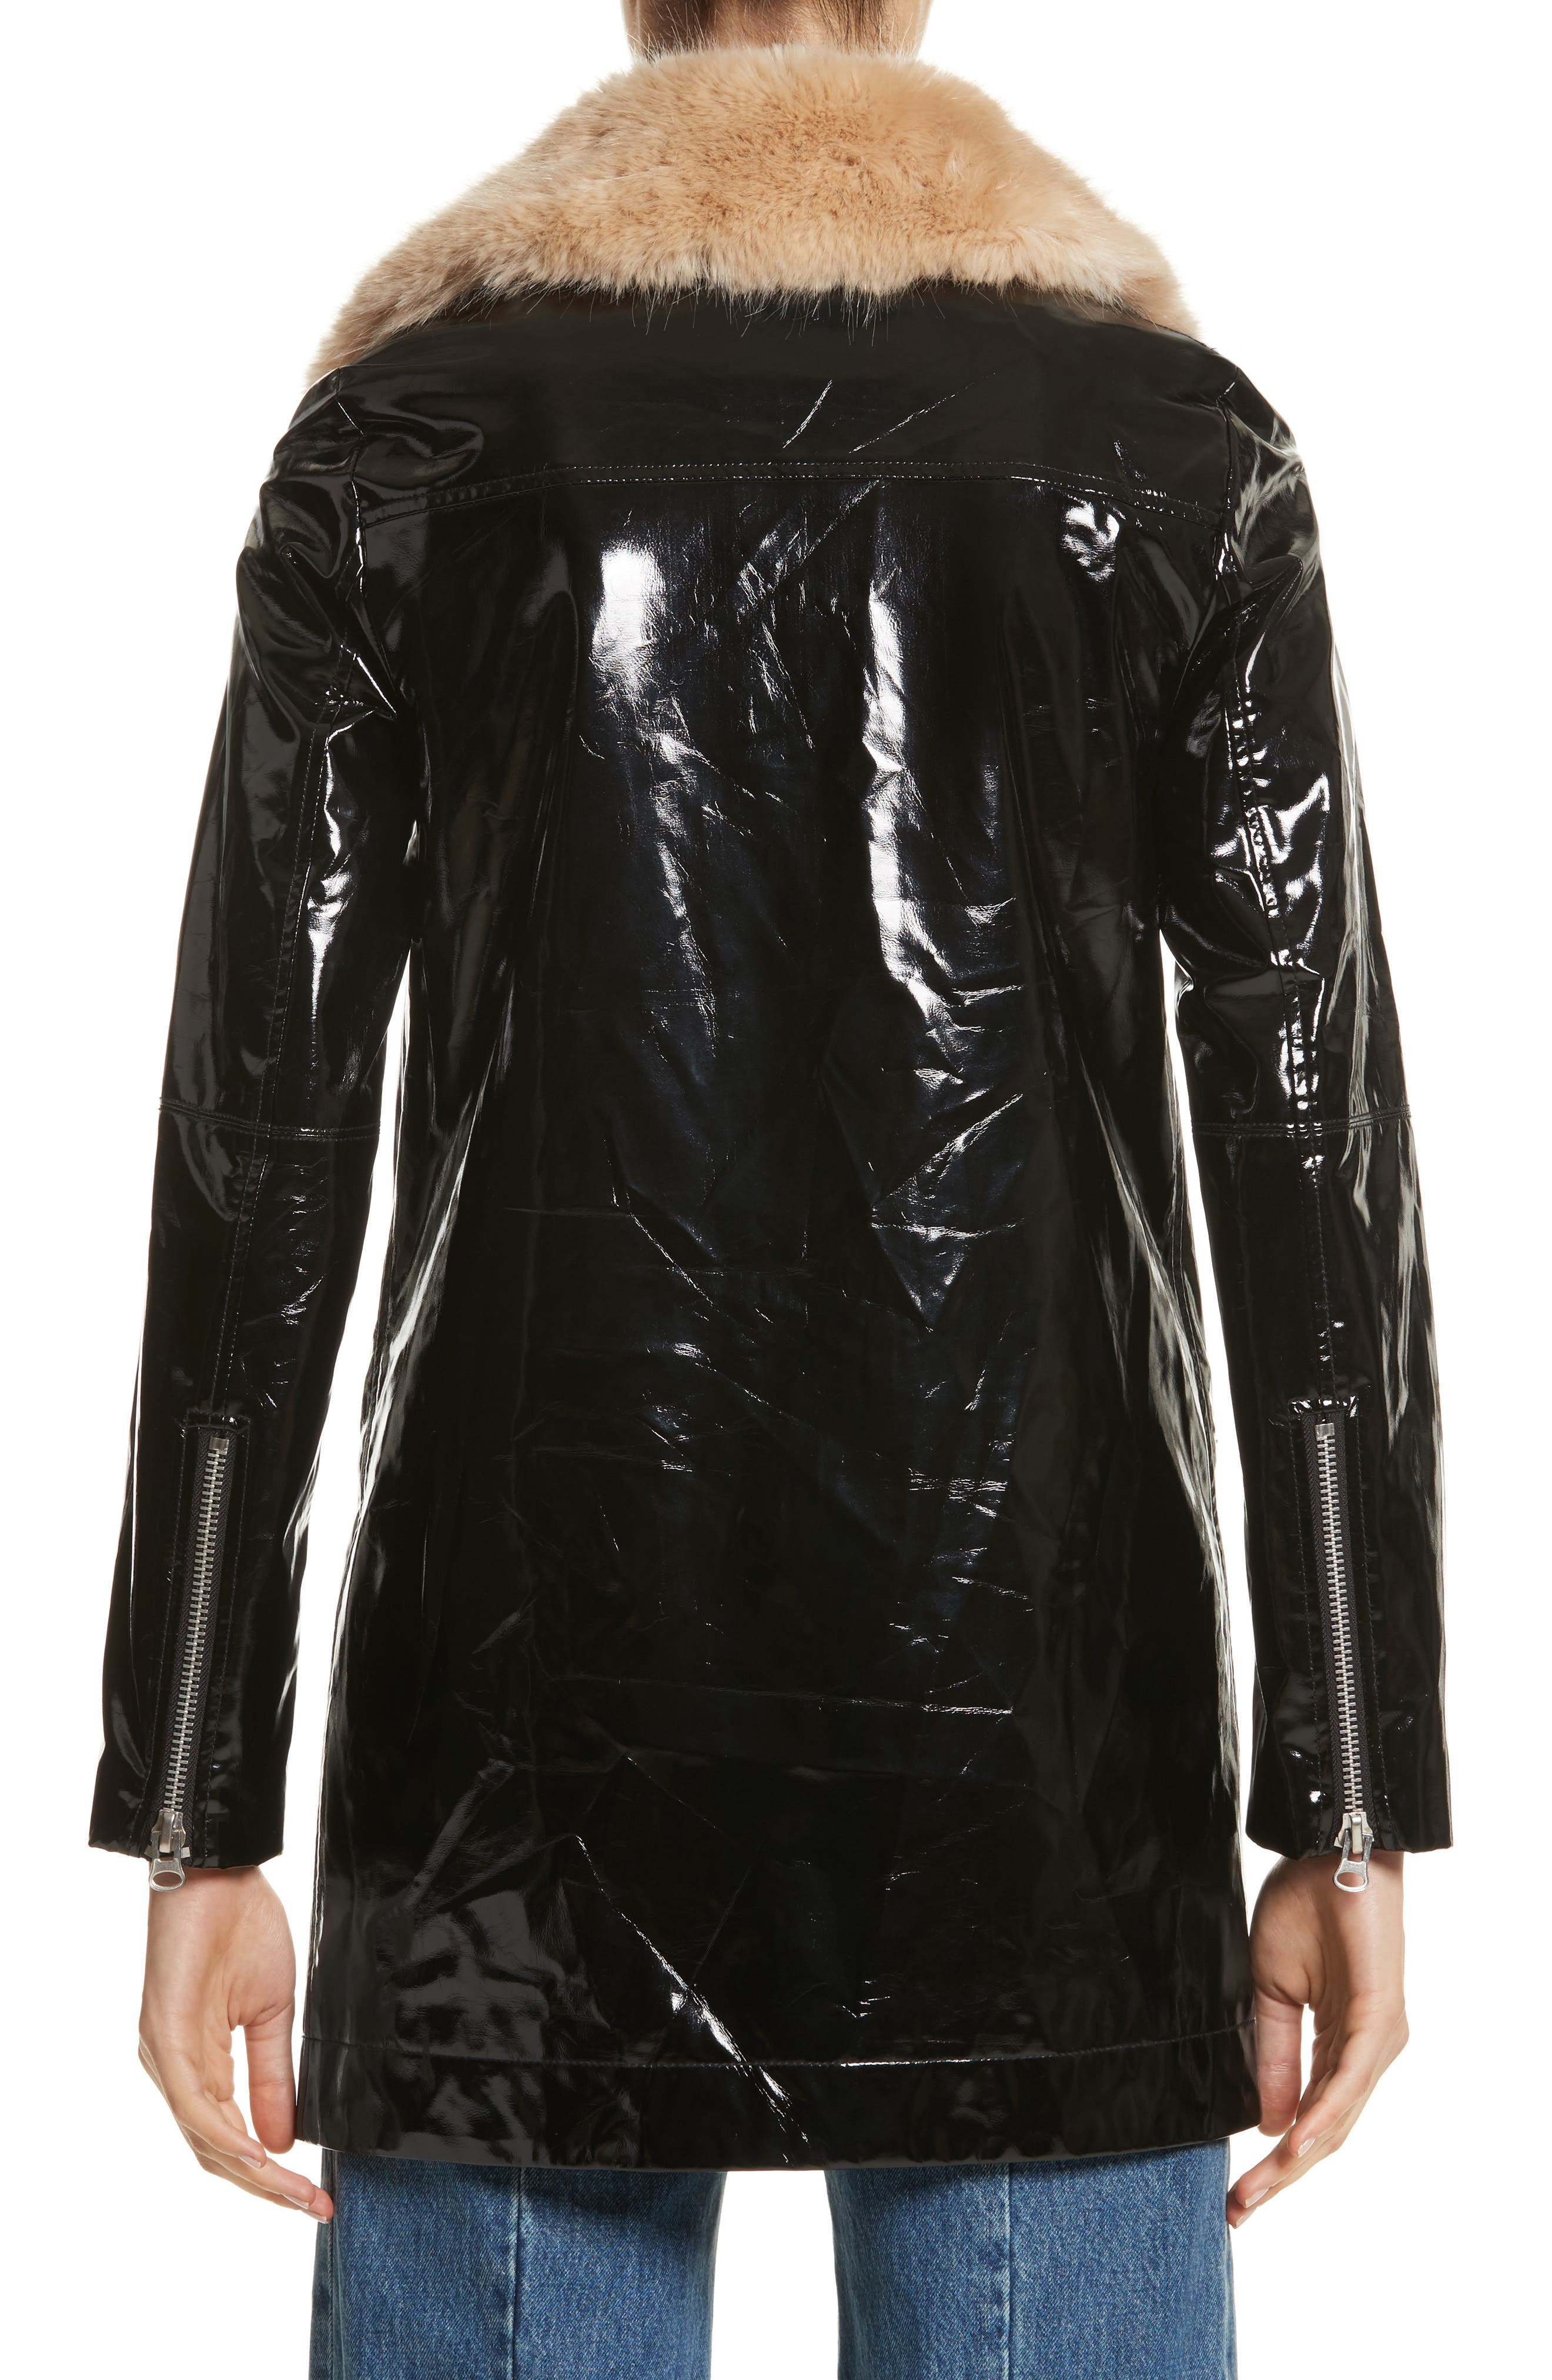 Olwen Faux Leather Long Biker Coat with Faux Fur Collar,                             Alternate thumbnail 3, color,                             001